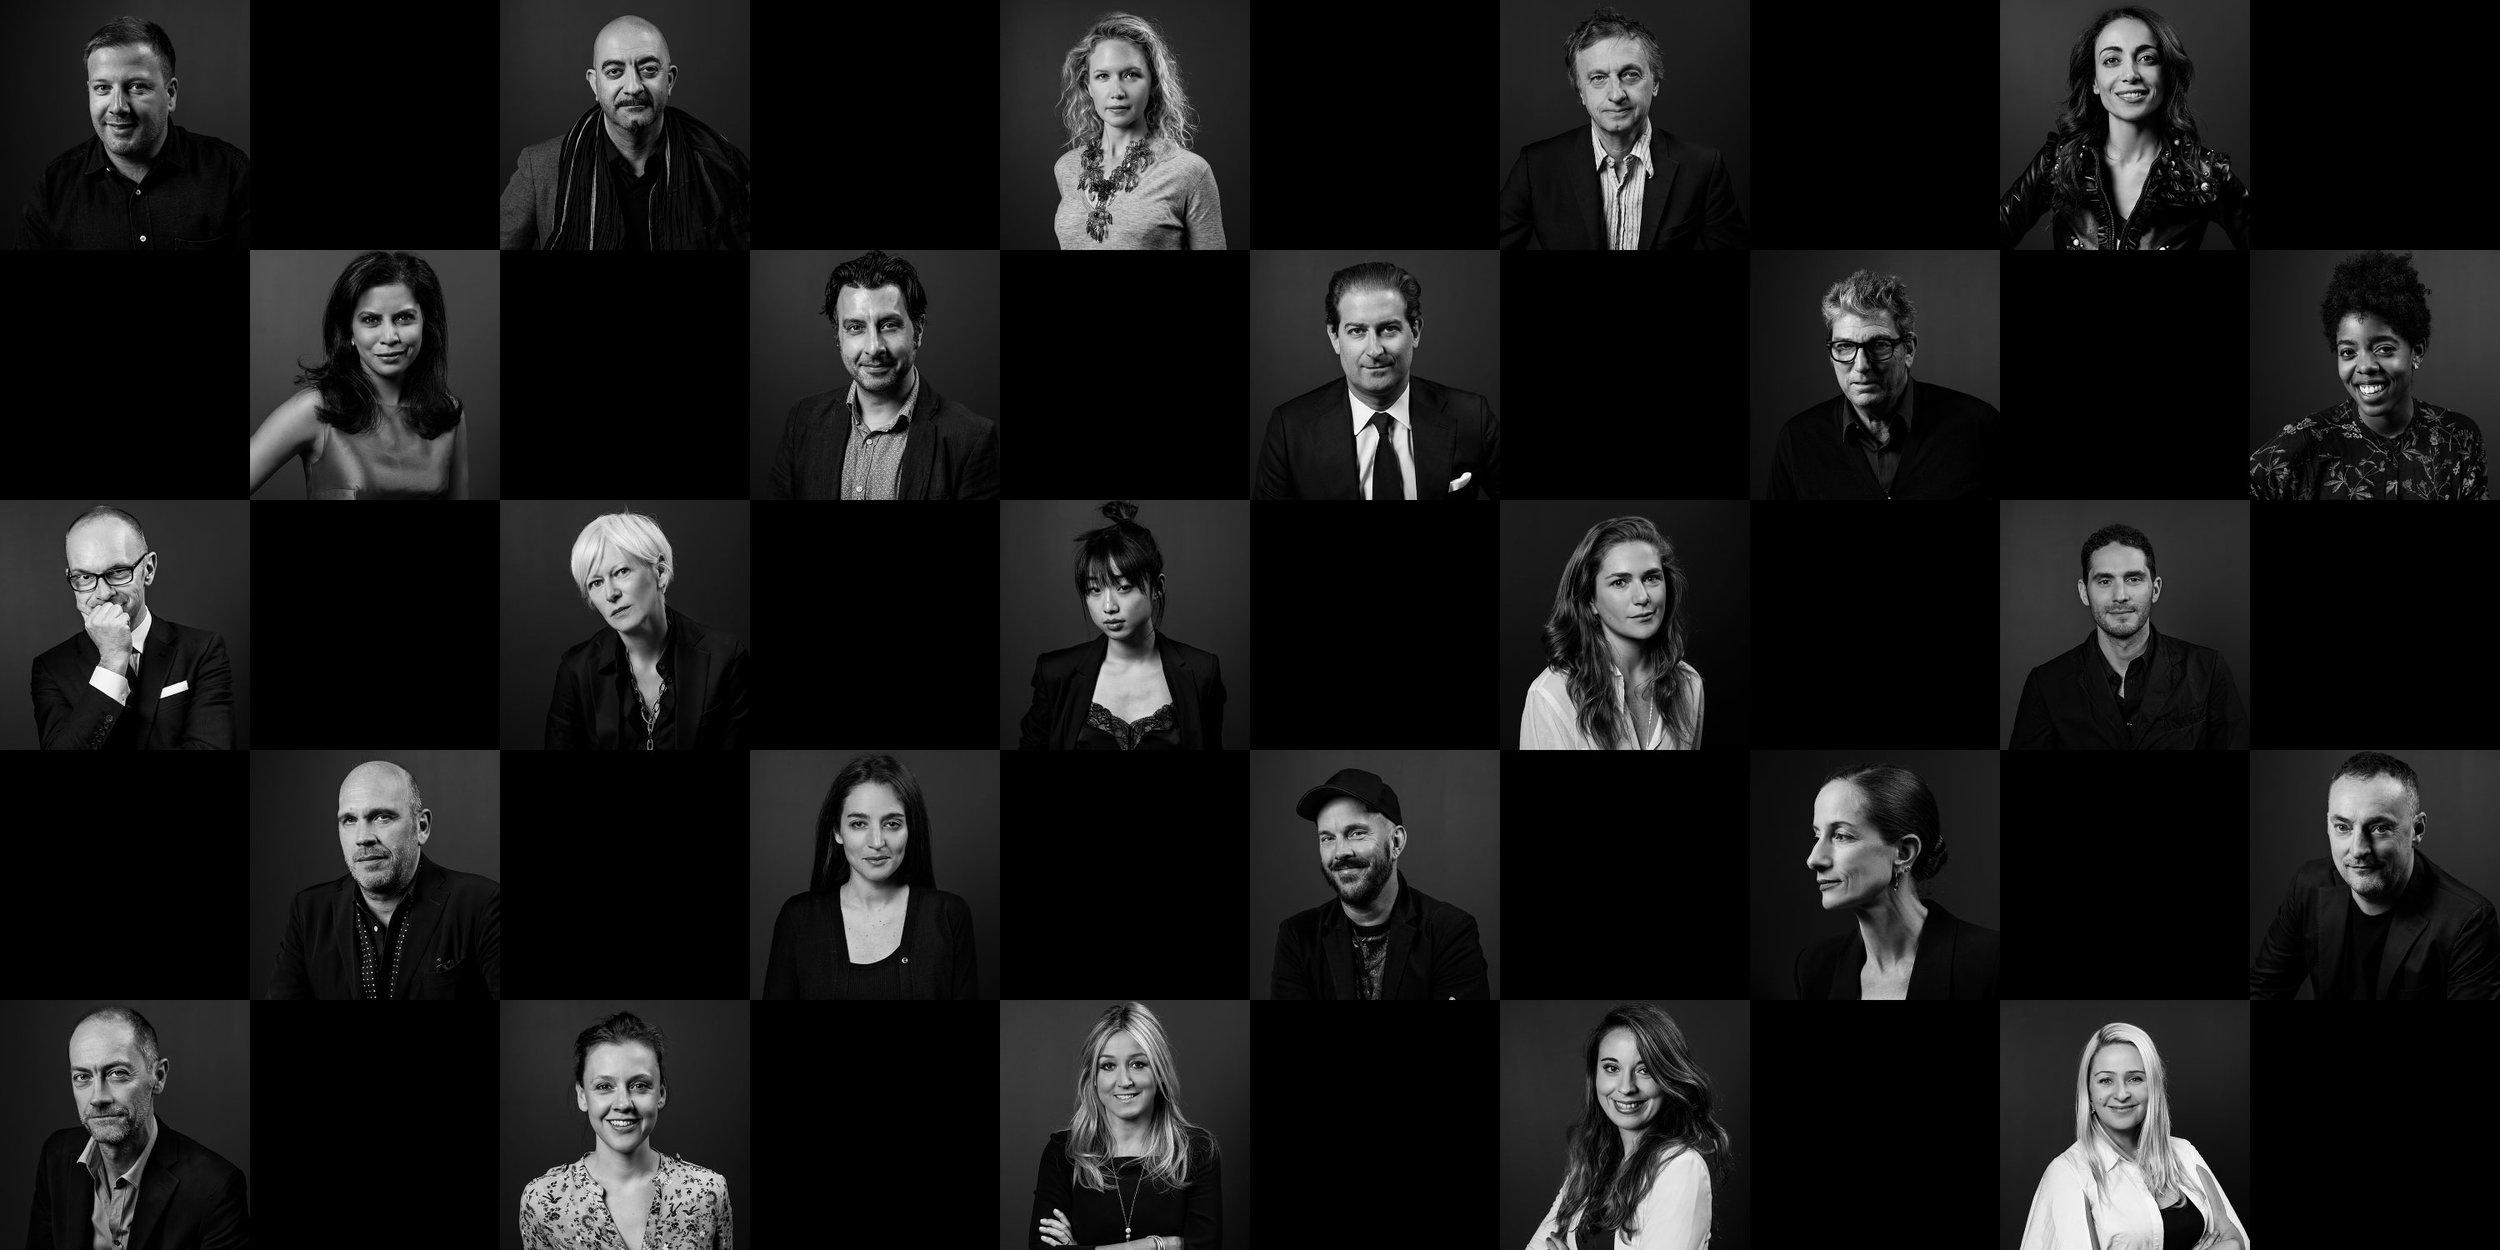 portraits3.jpg